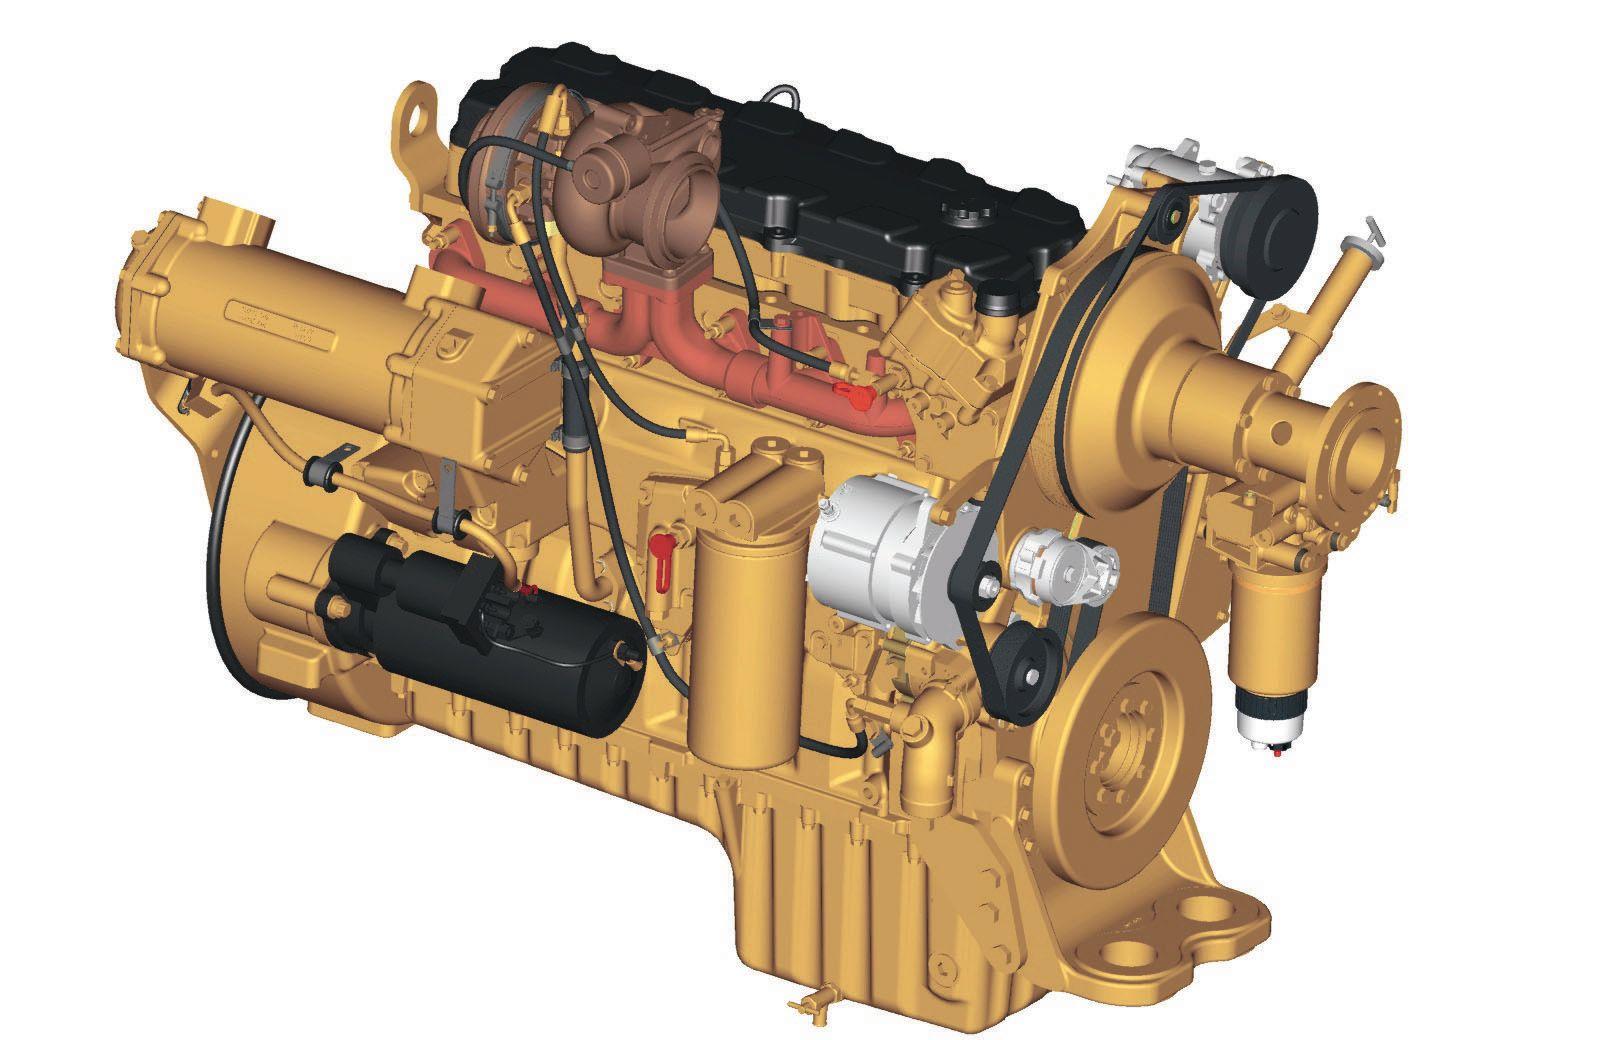 Power Train. The Cat® C9 engine ...